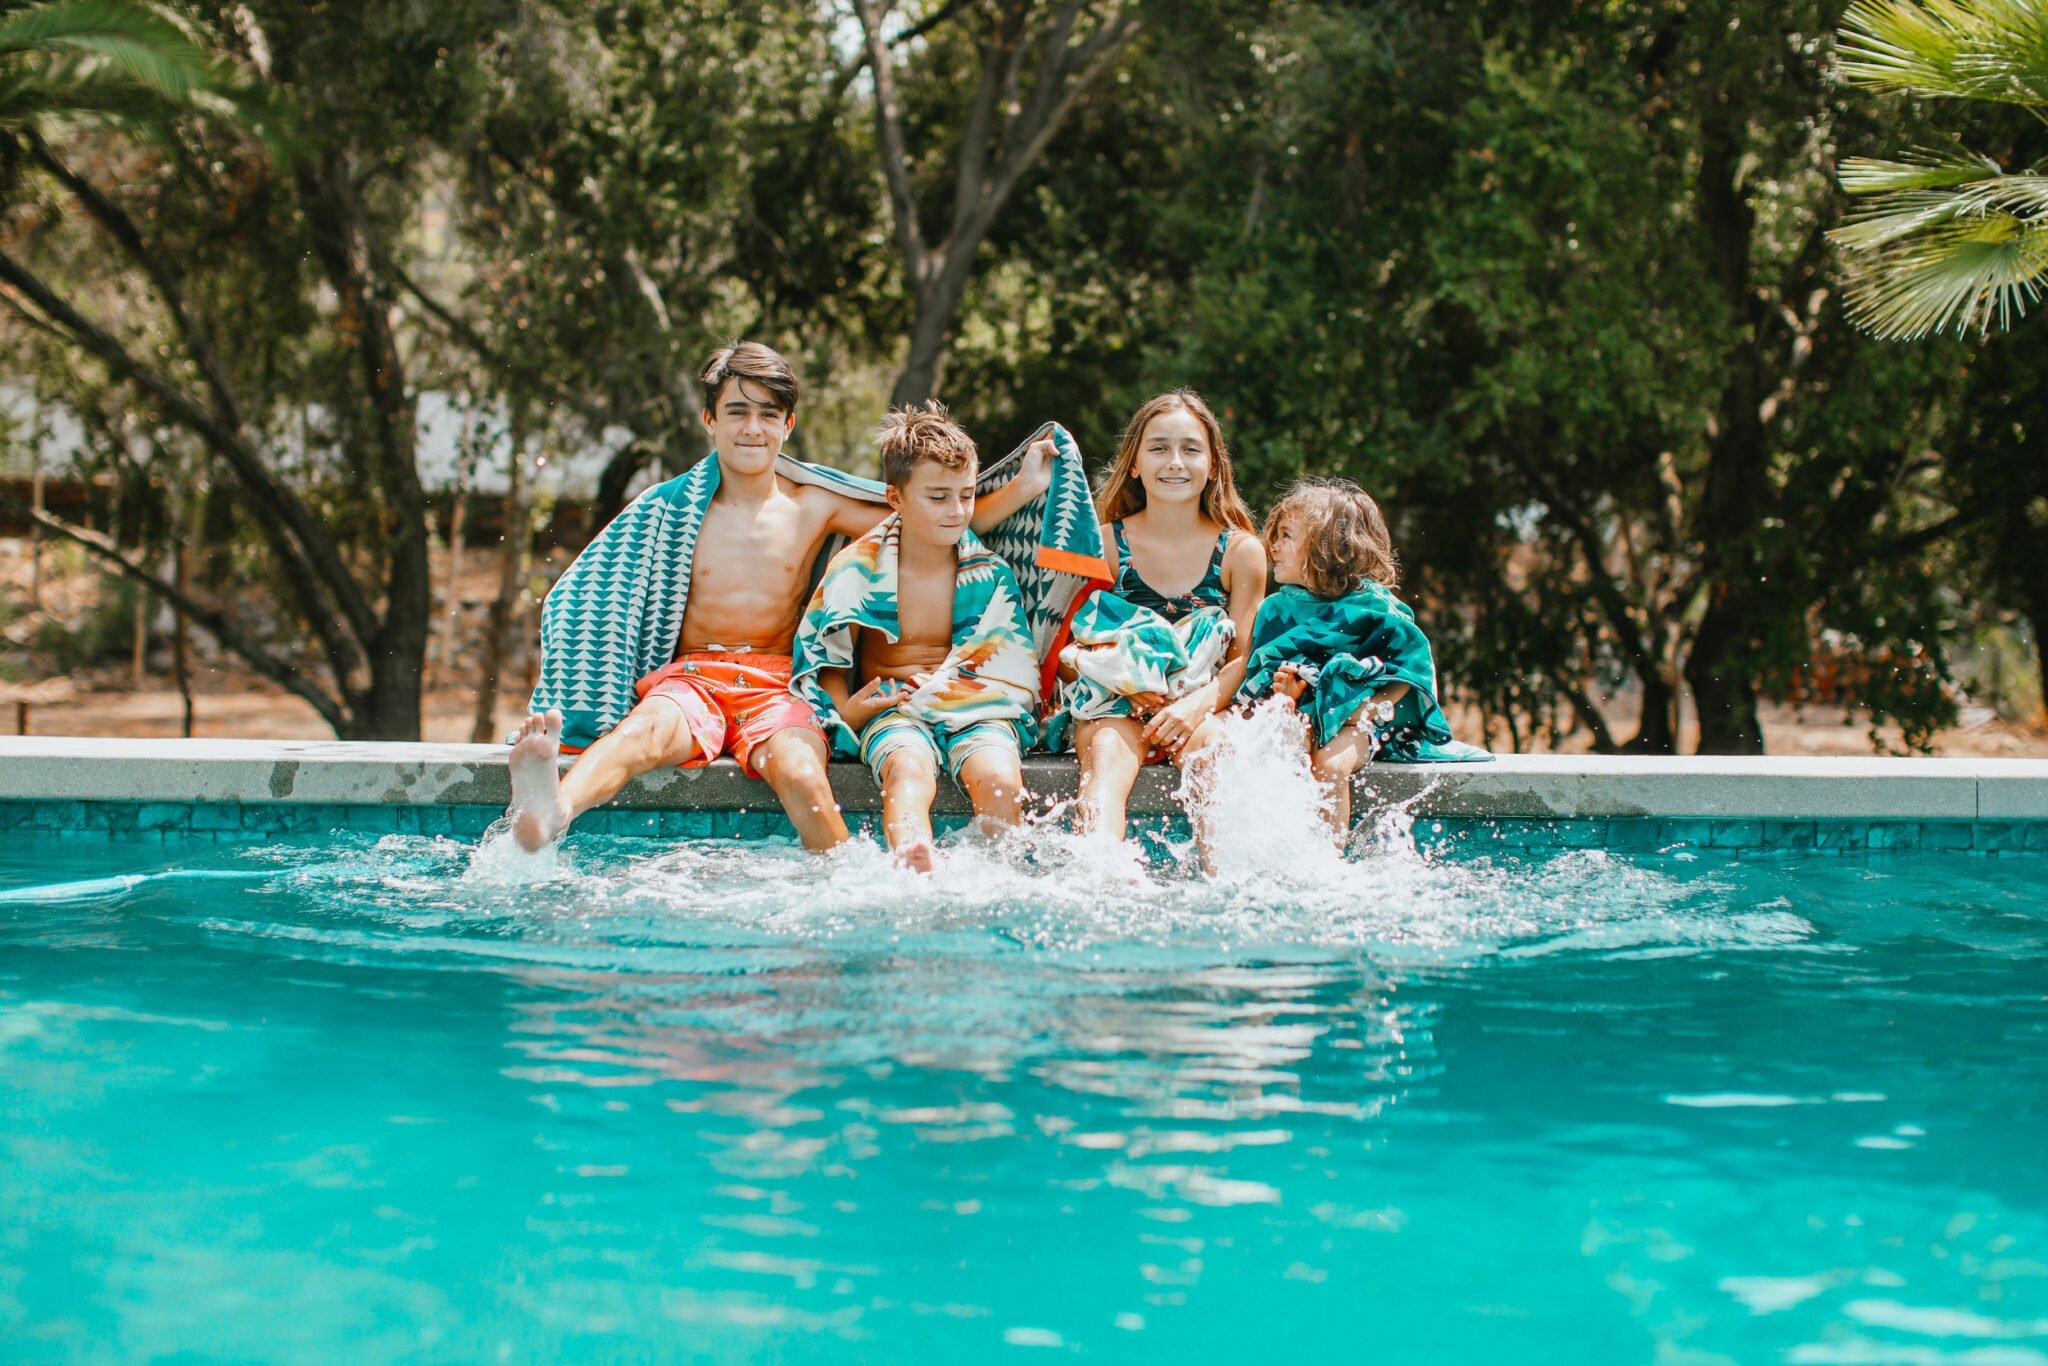 kids sitting in pool